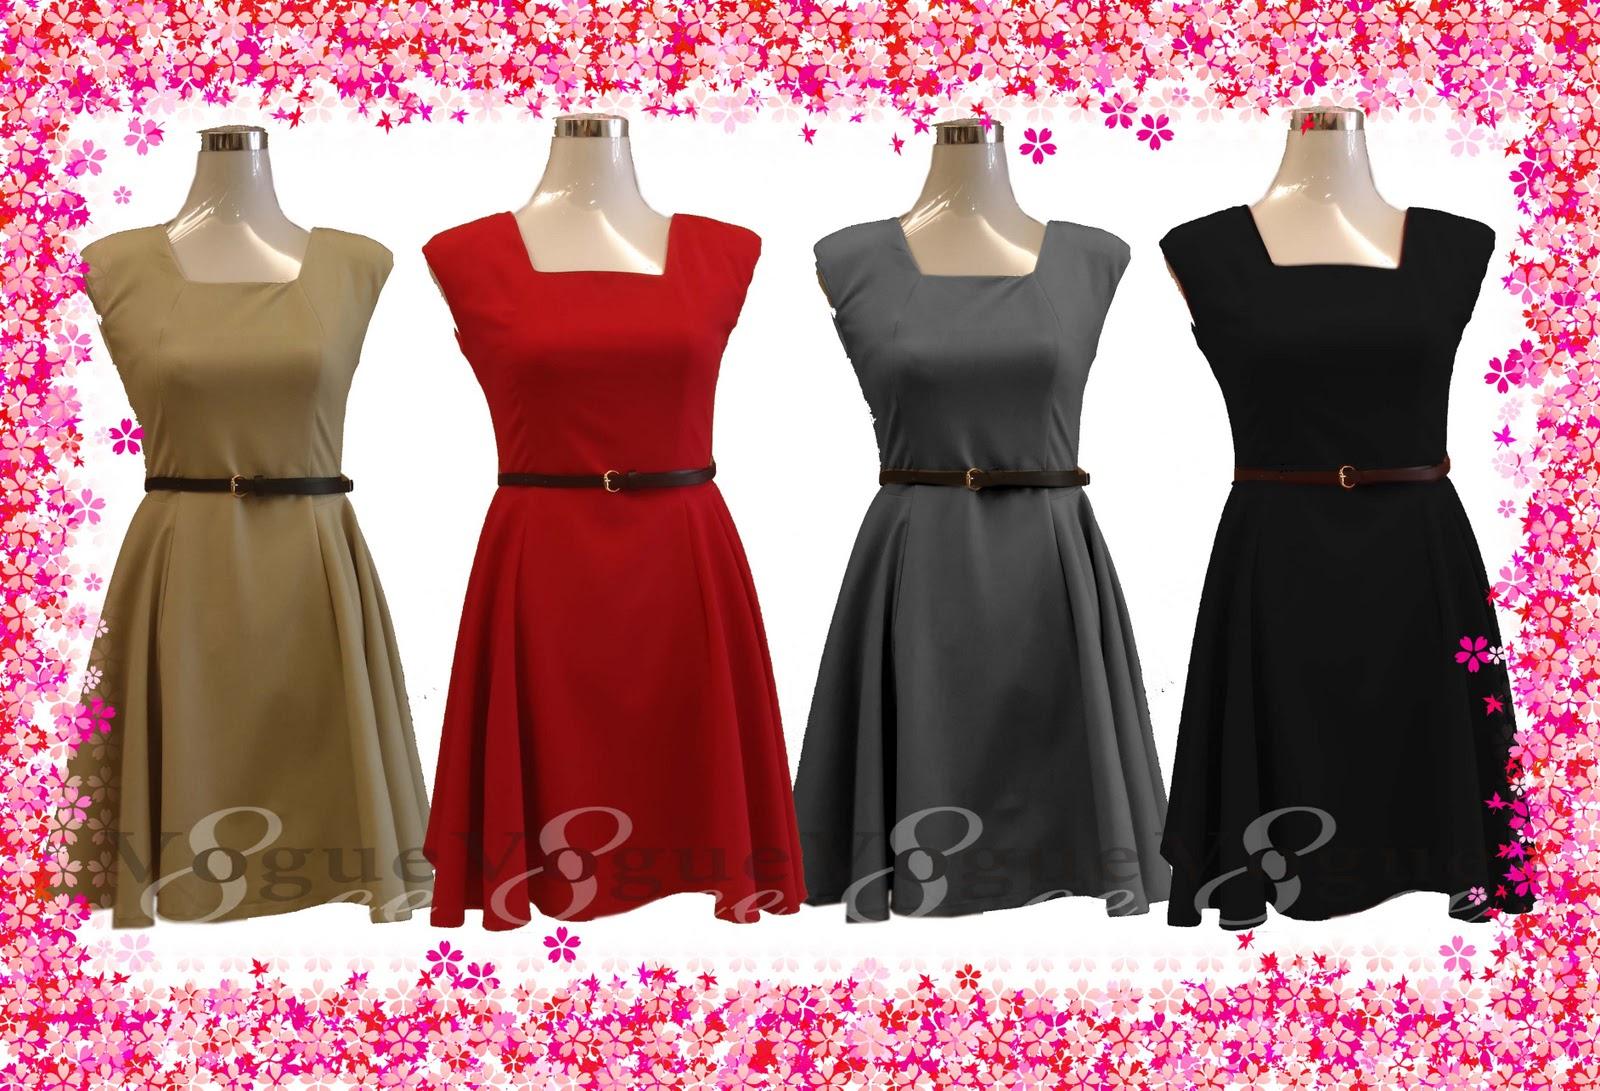 http://4.bp.blogspot.com/-kBT29mZRbpE/Tv1uD4WTqmI/AAAAAAAAAKI/ZTDS7fnemJc/s1600/Victoria+Beckham+Flare+Dress_+Multicolor.jpg